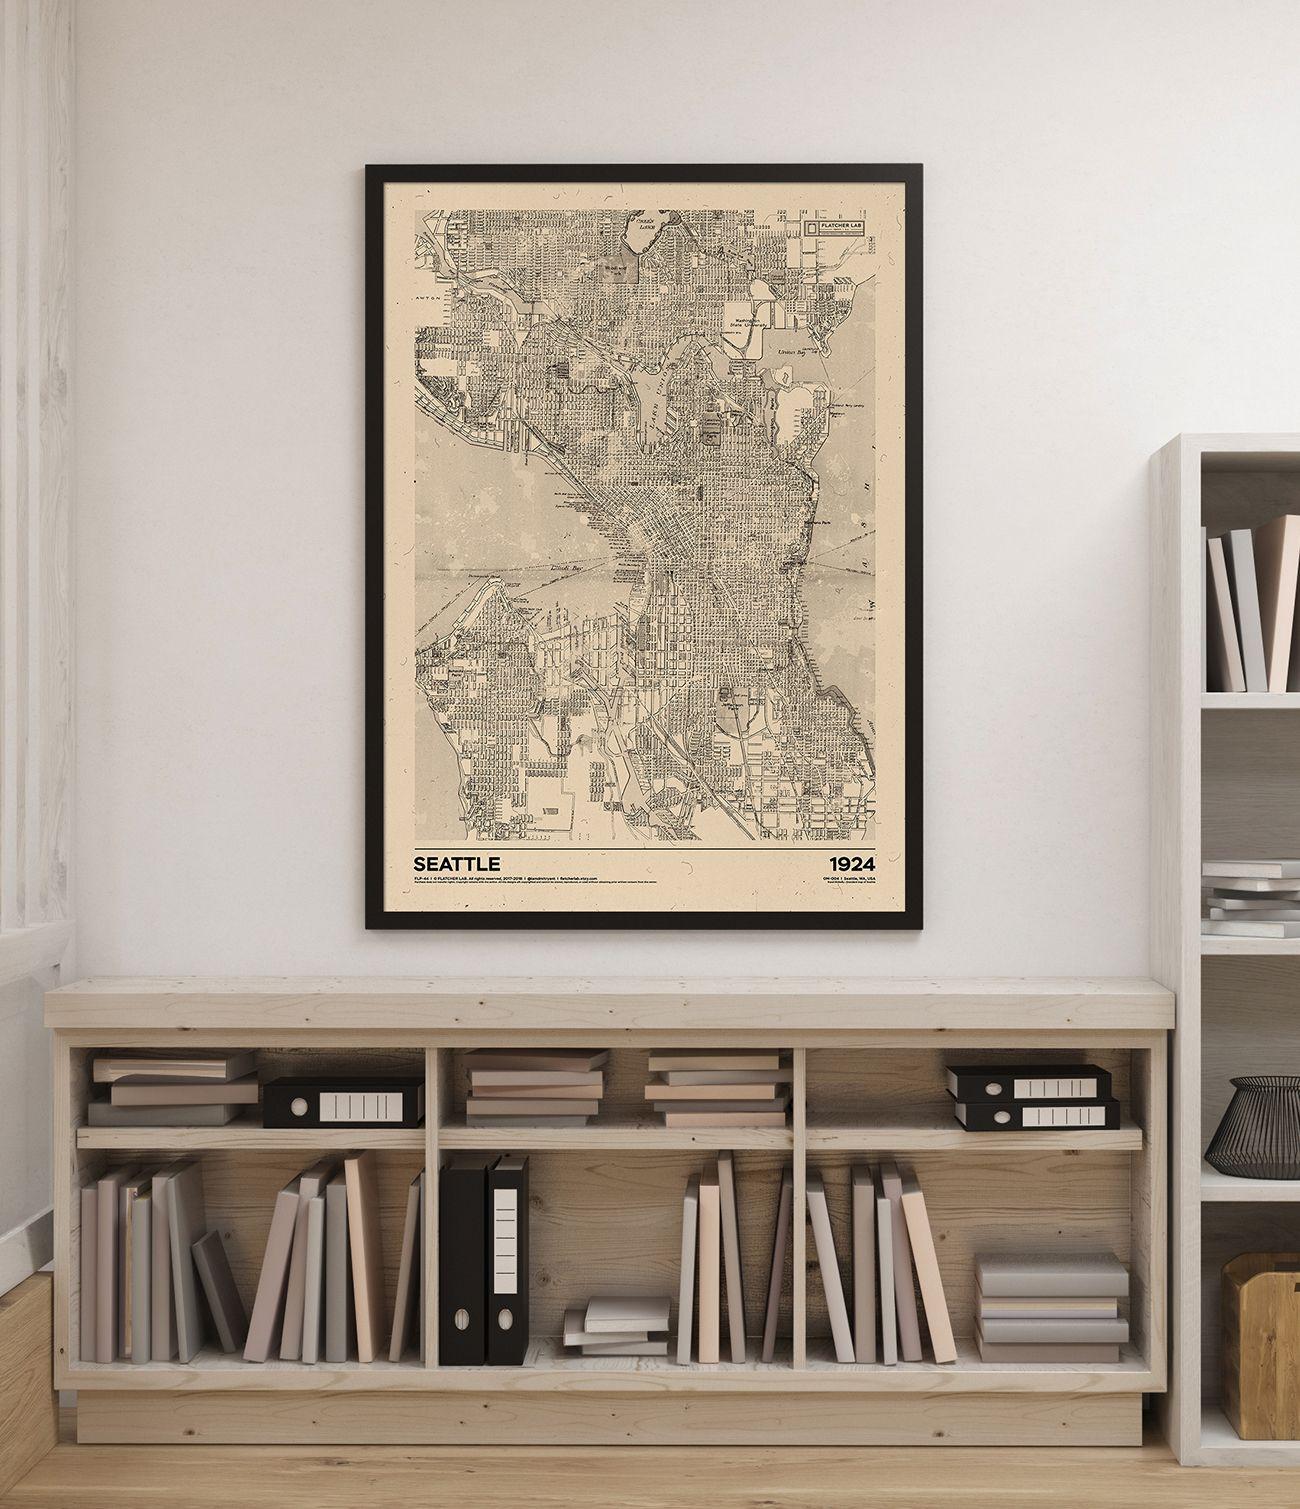 Seattle 1924 Old map Flatcher Lab